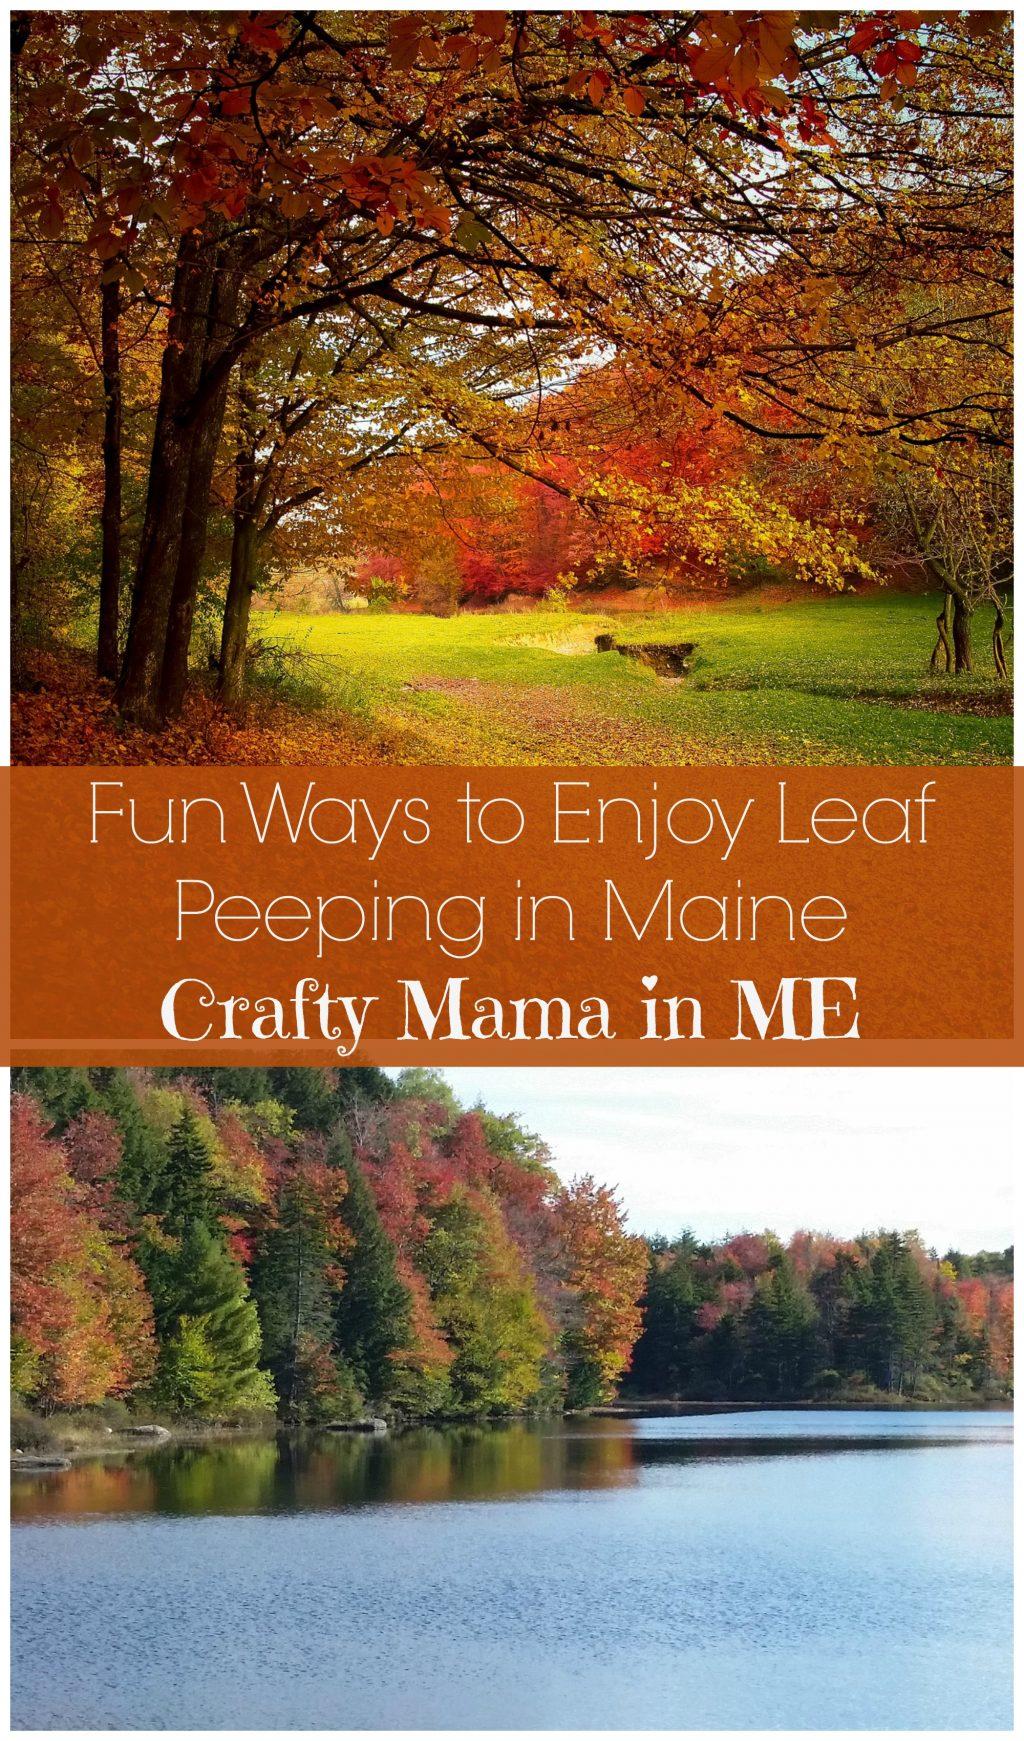 Fun Ways to Enjoy Leaf Peeping in Maine